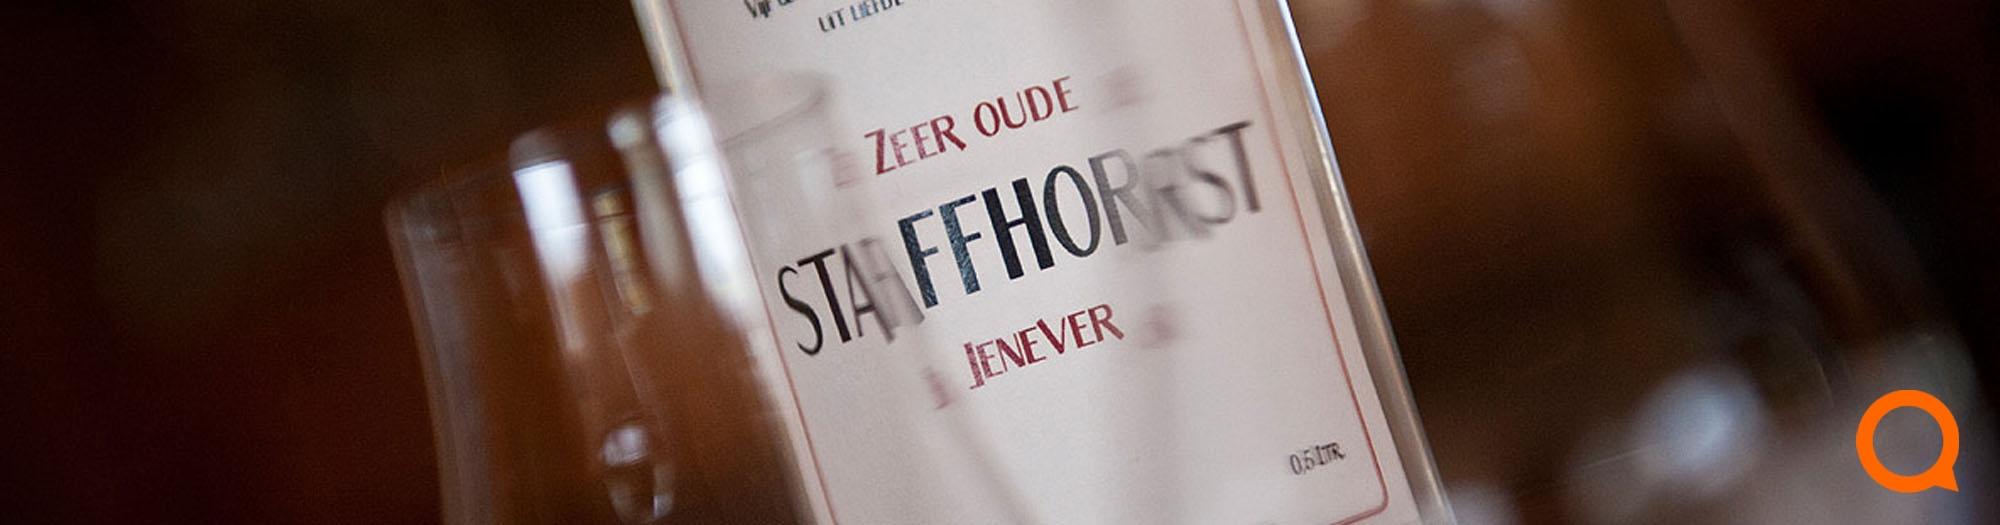 Staffhorst Jenever